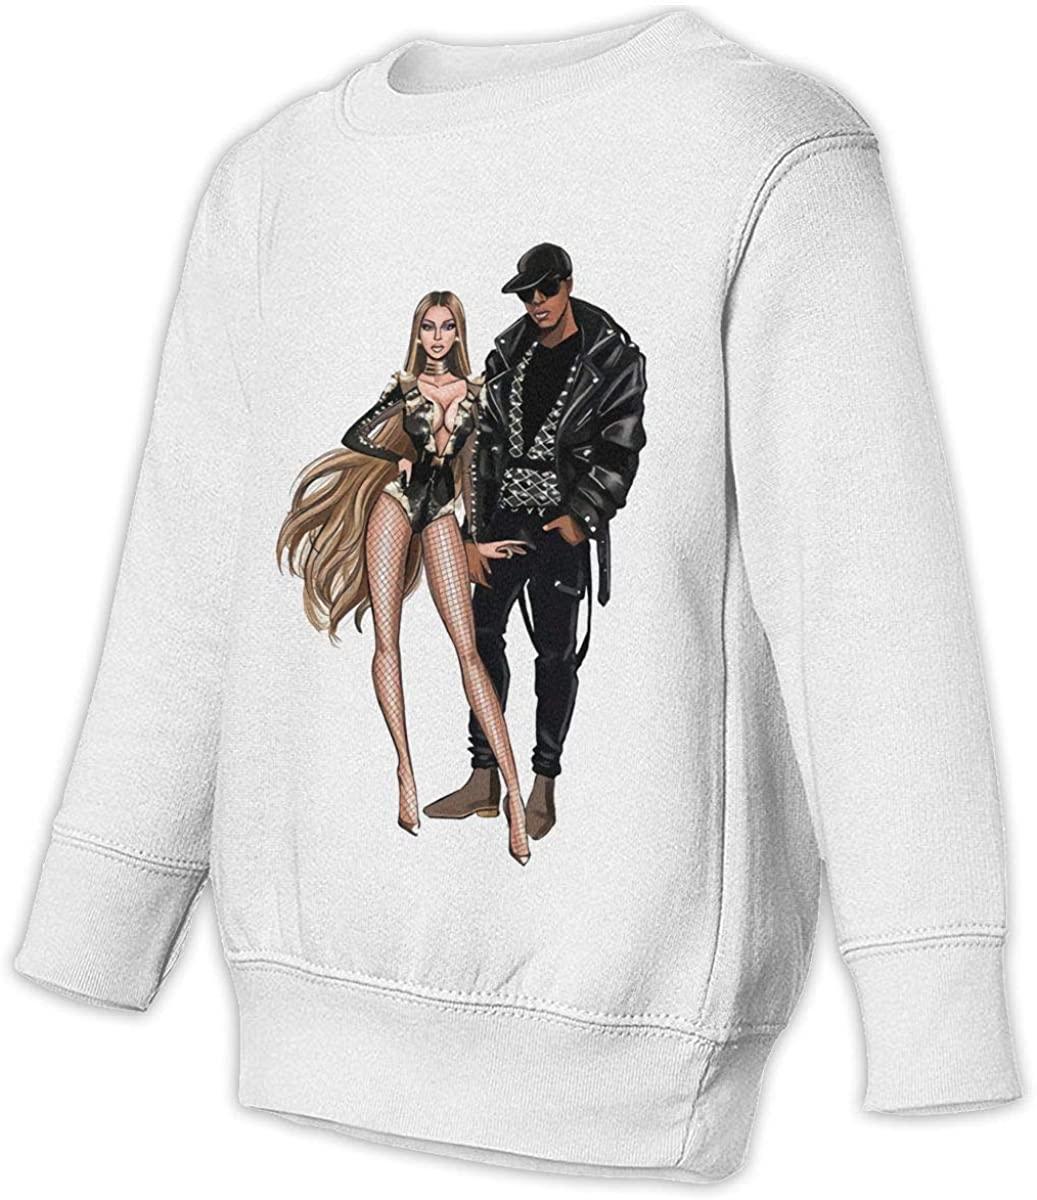 LSHLKJDFN _Jay-Z Music Unisex Sweatshirt Youth Boy and Girls Pullover Sweatshirt White